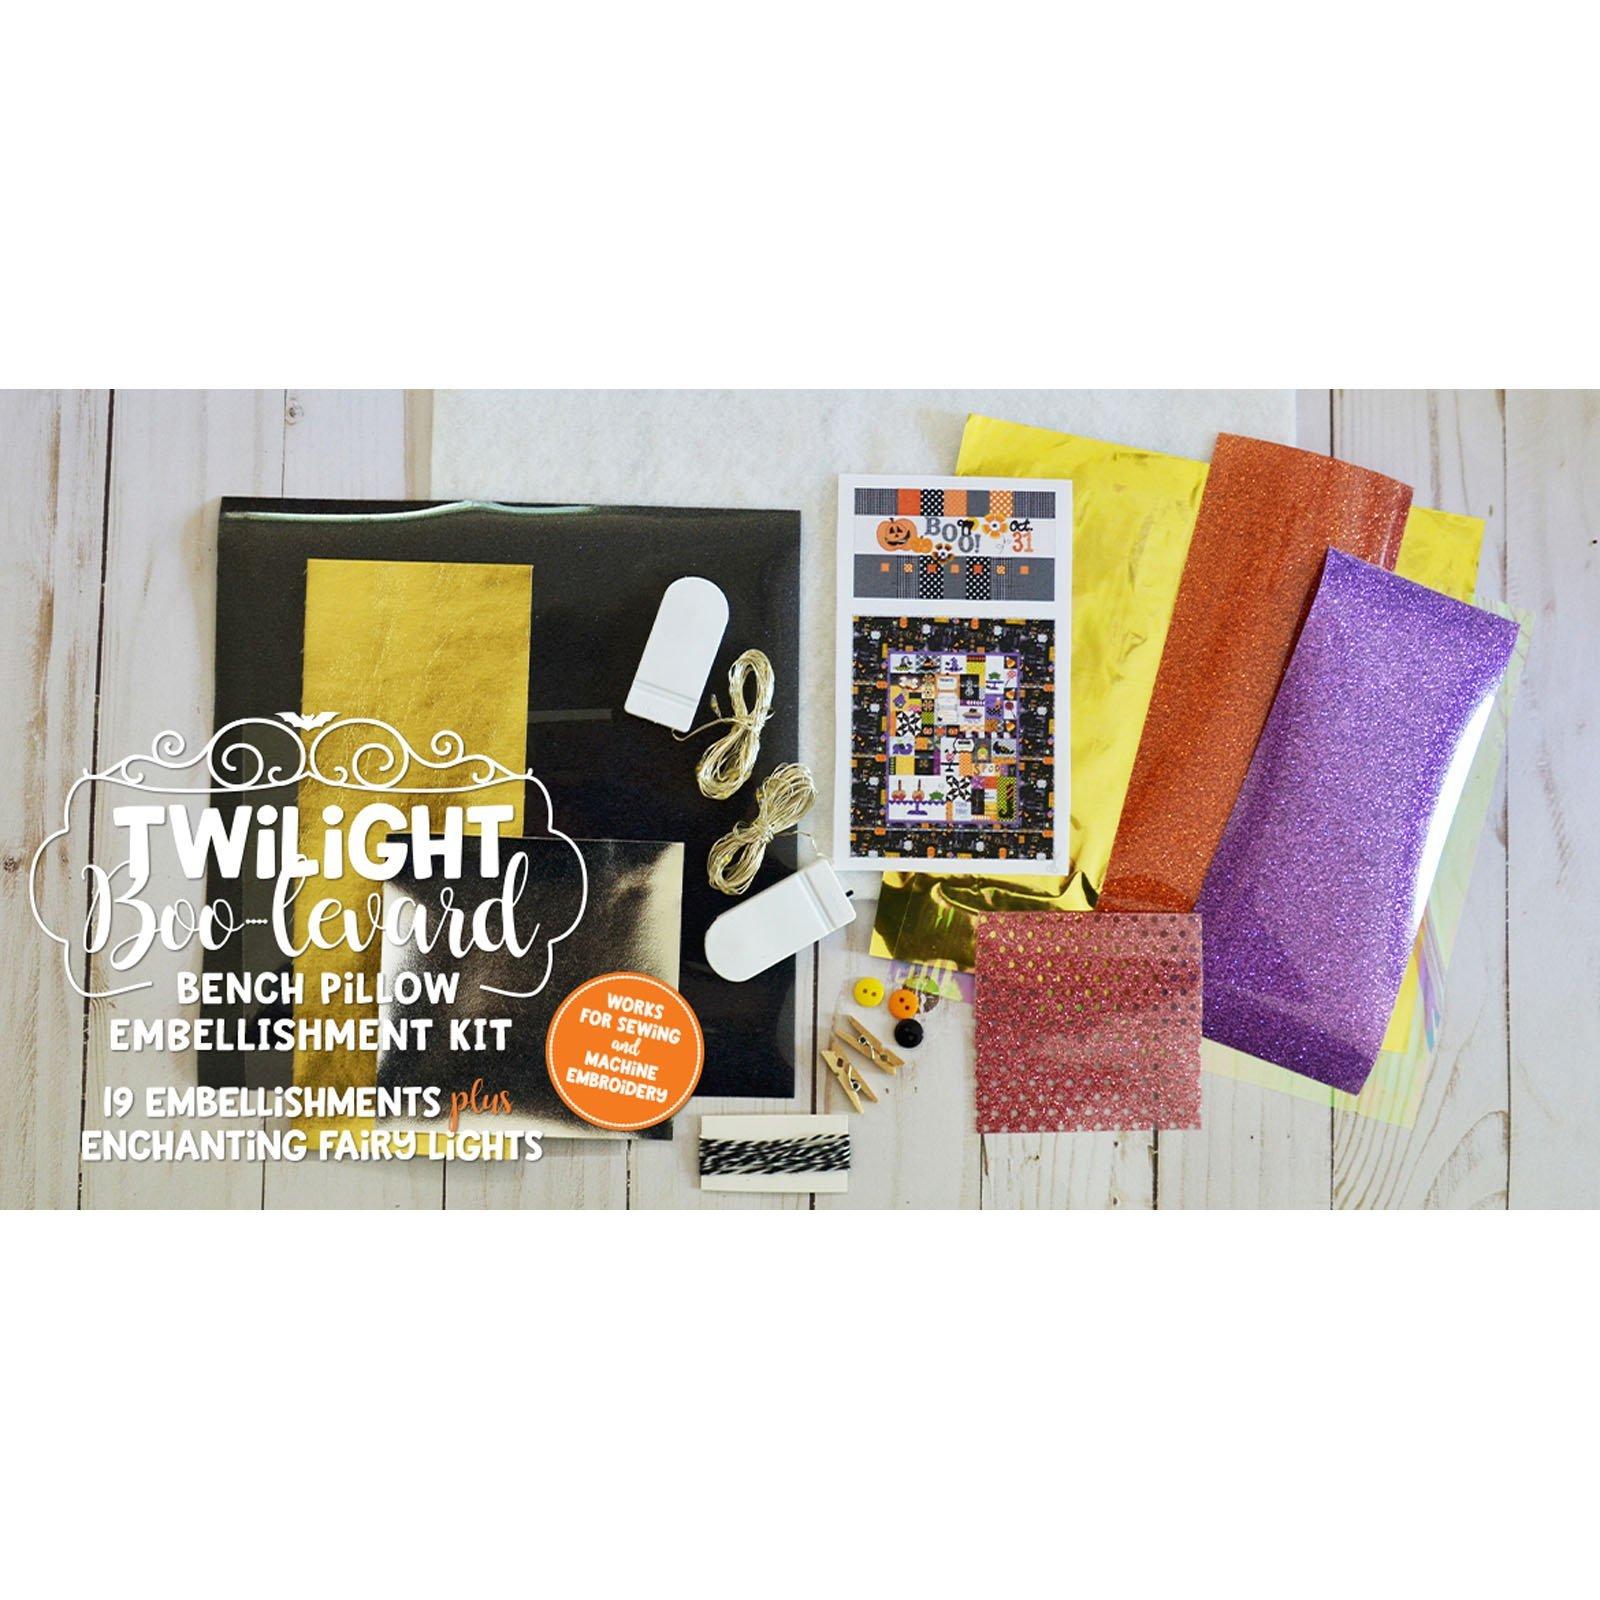 Kimberbell Twilight Boo-Levard Embellishment Kit